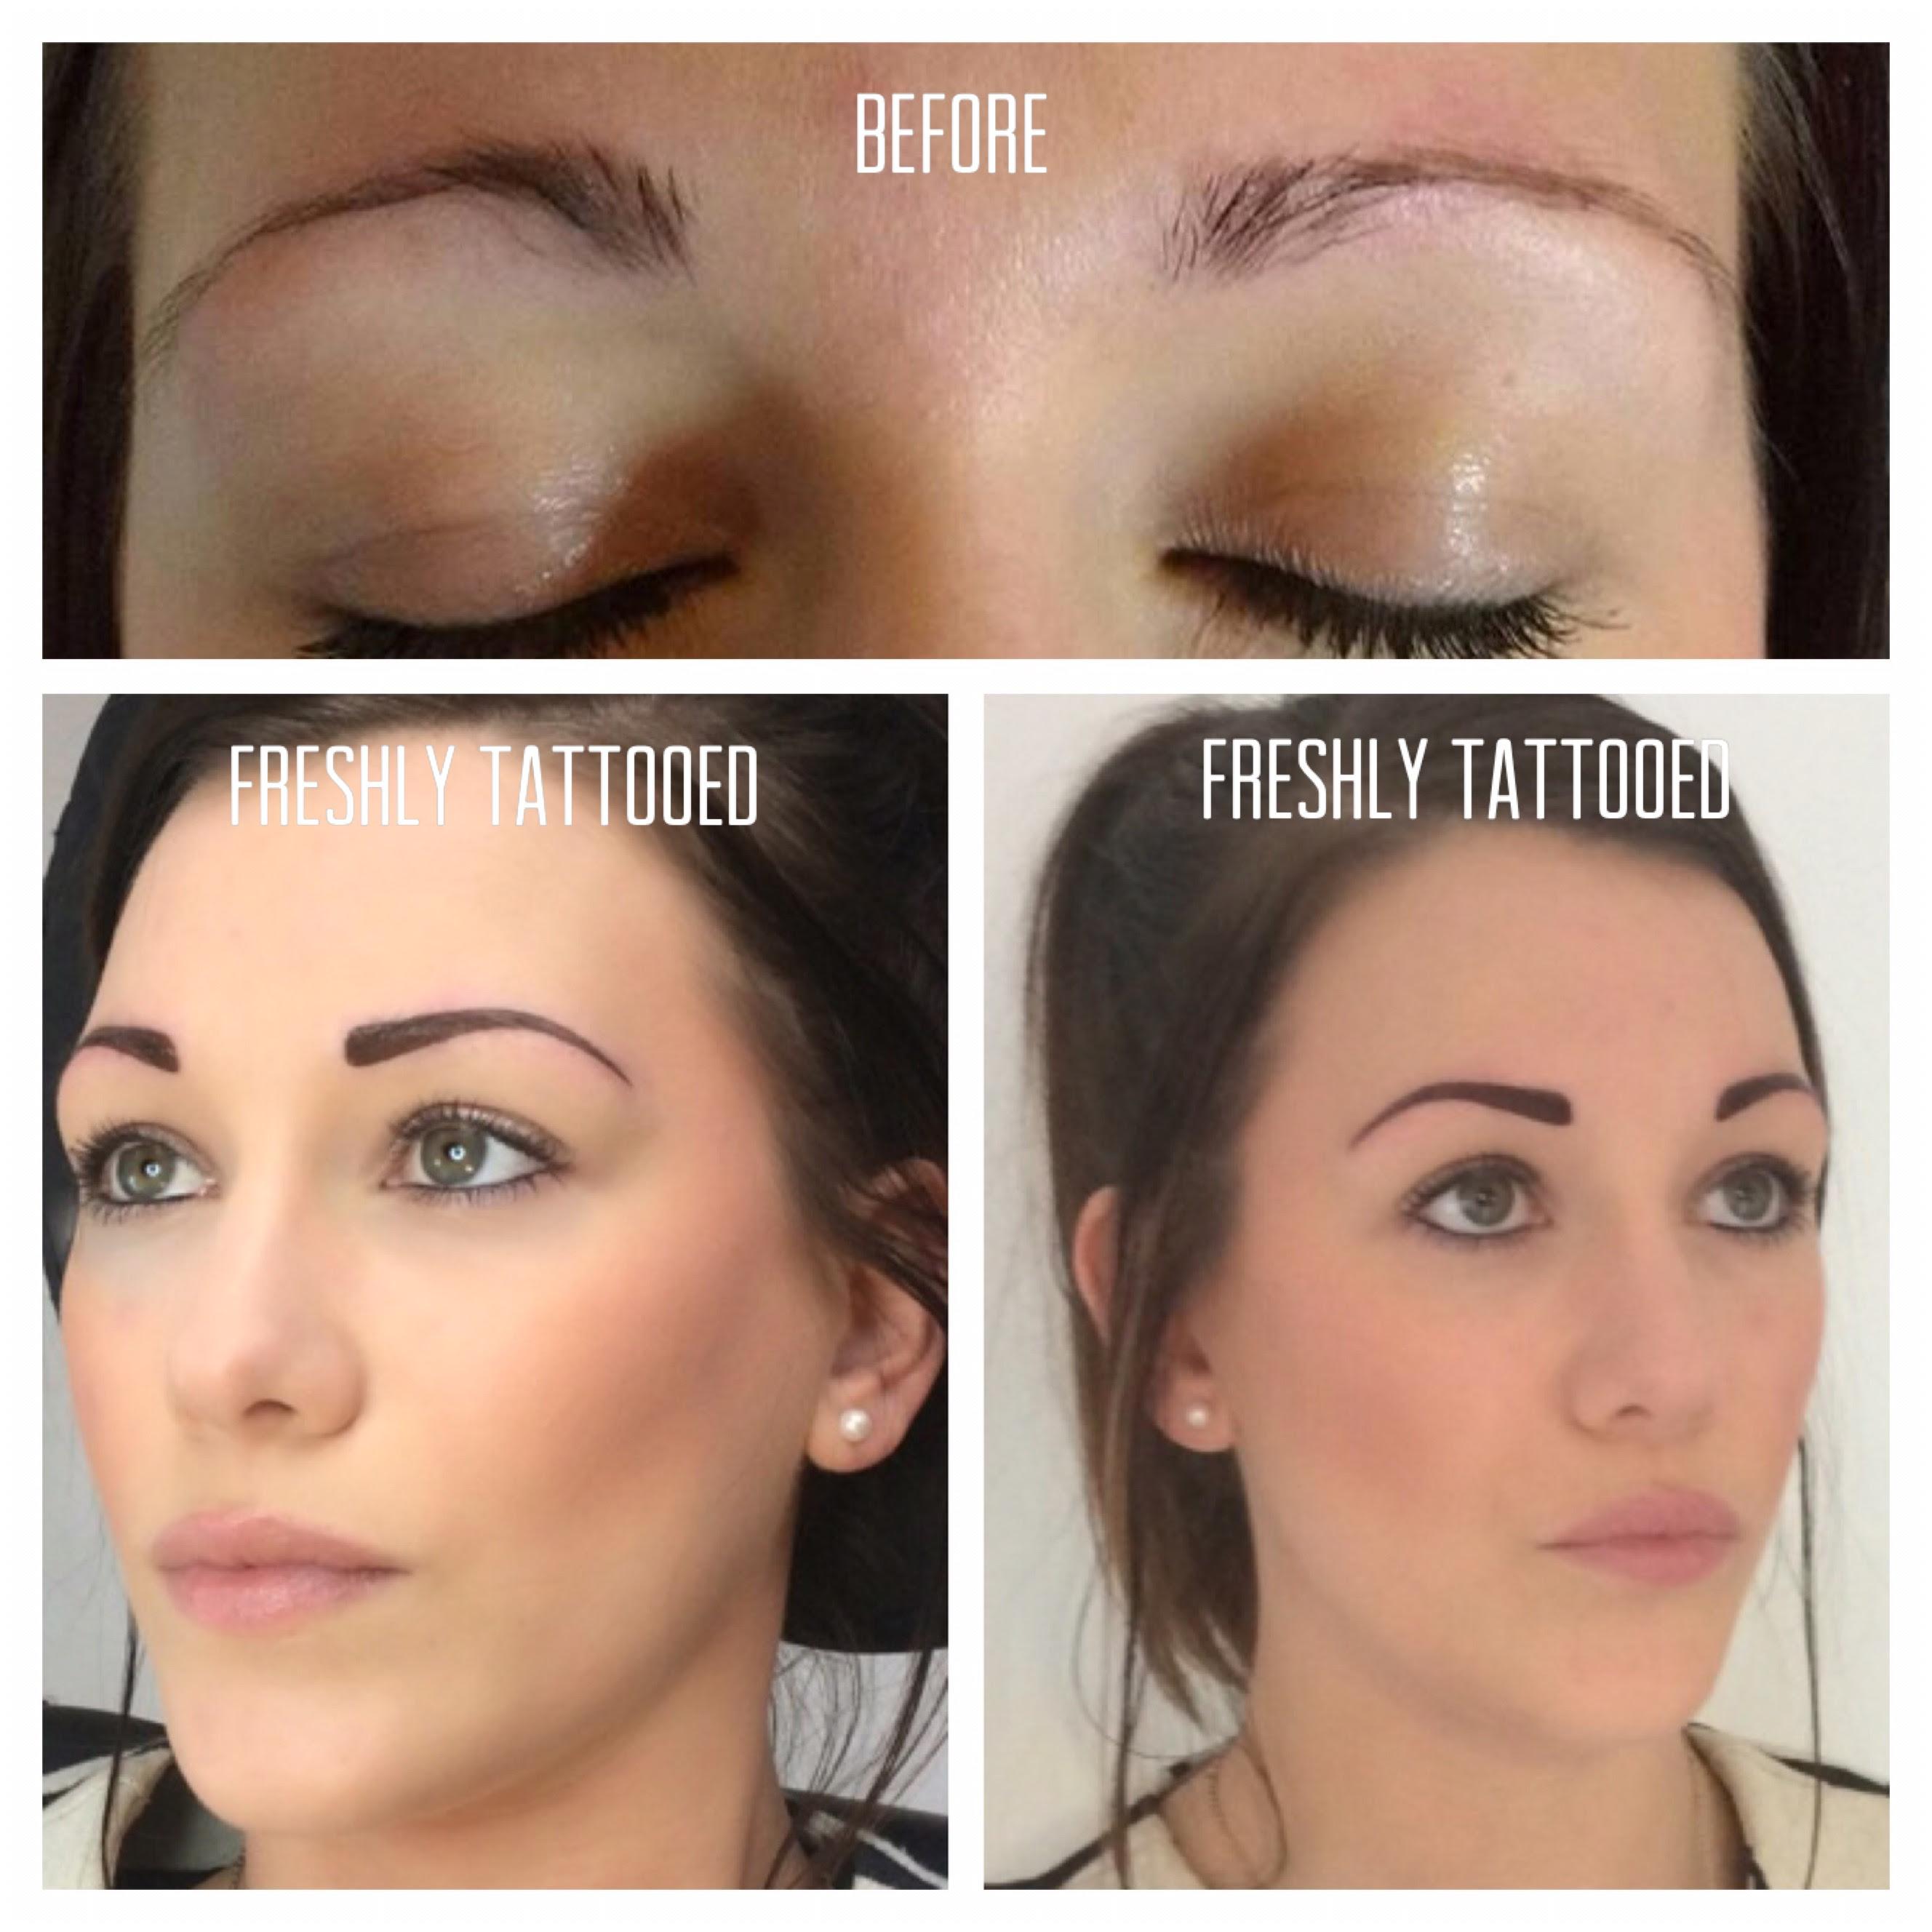 Cornwall Permanent Makeup Client 1